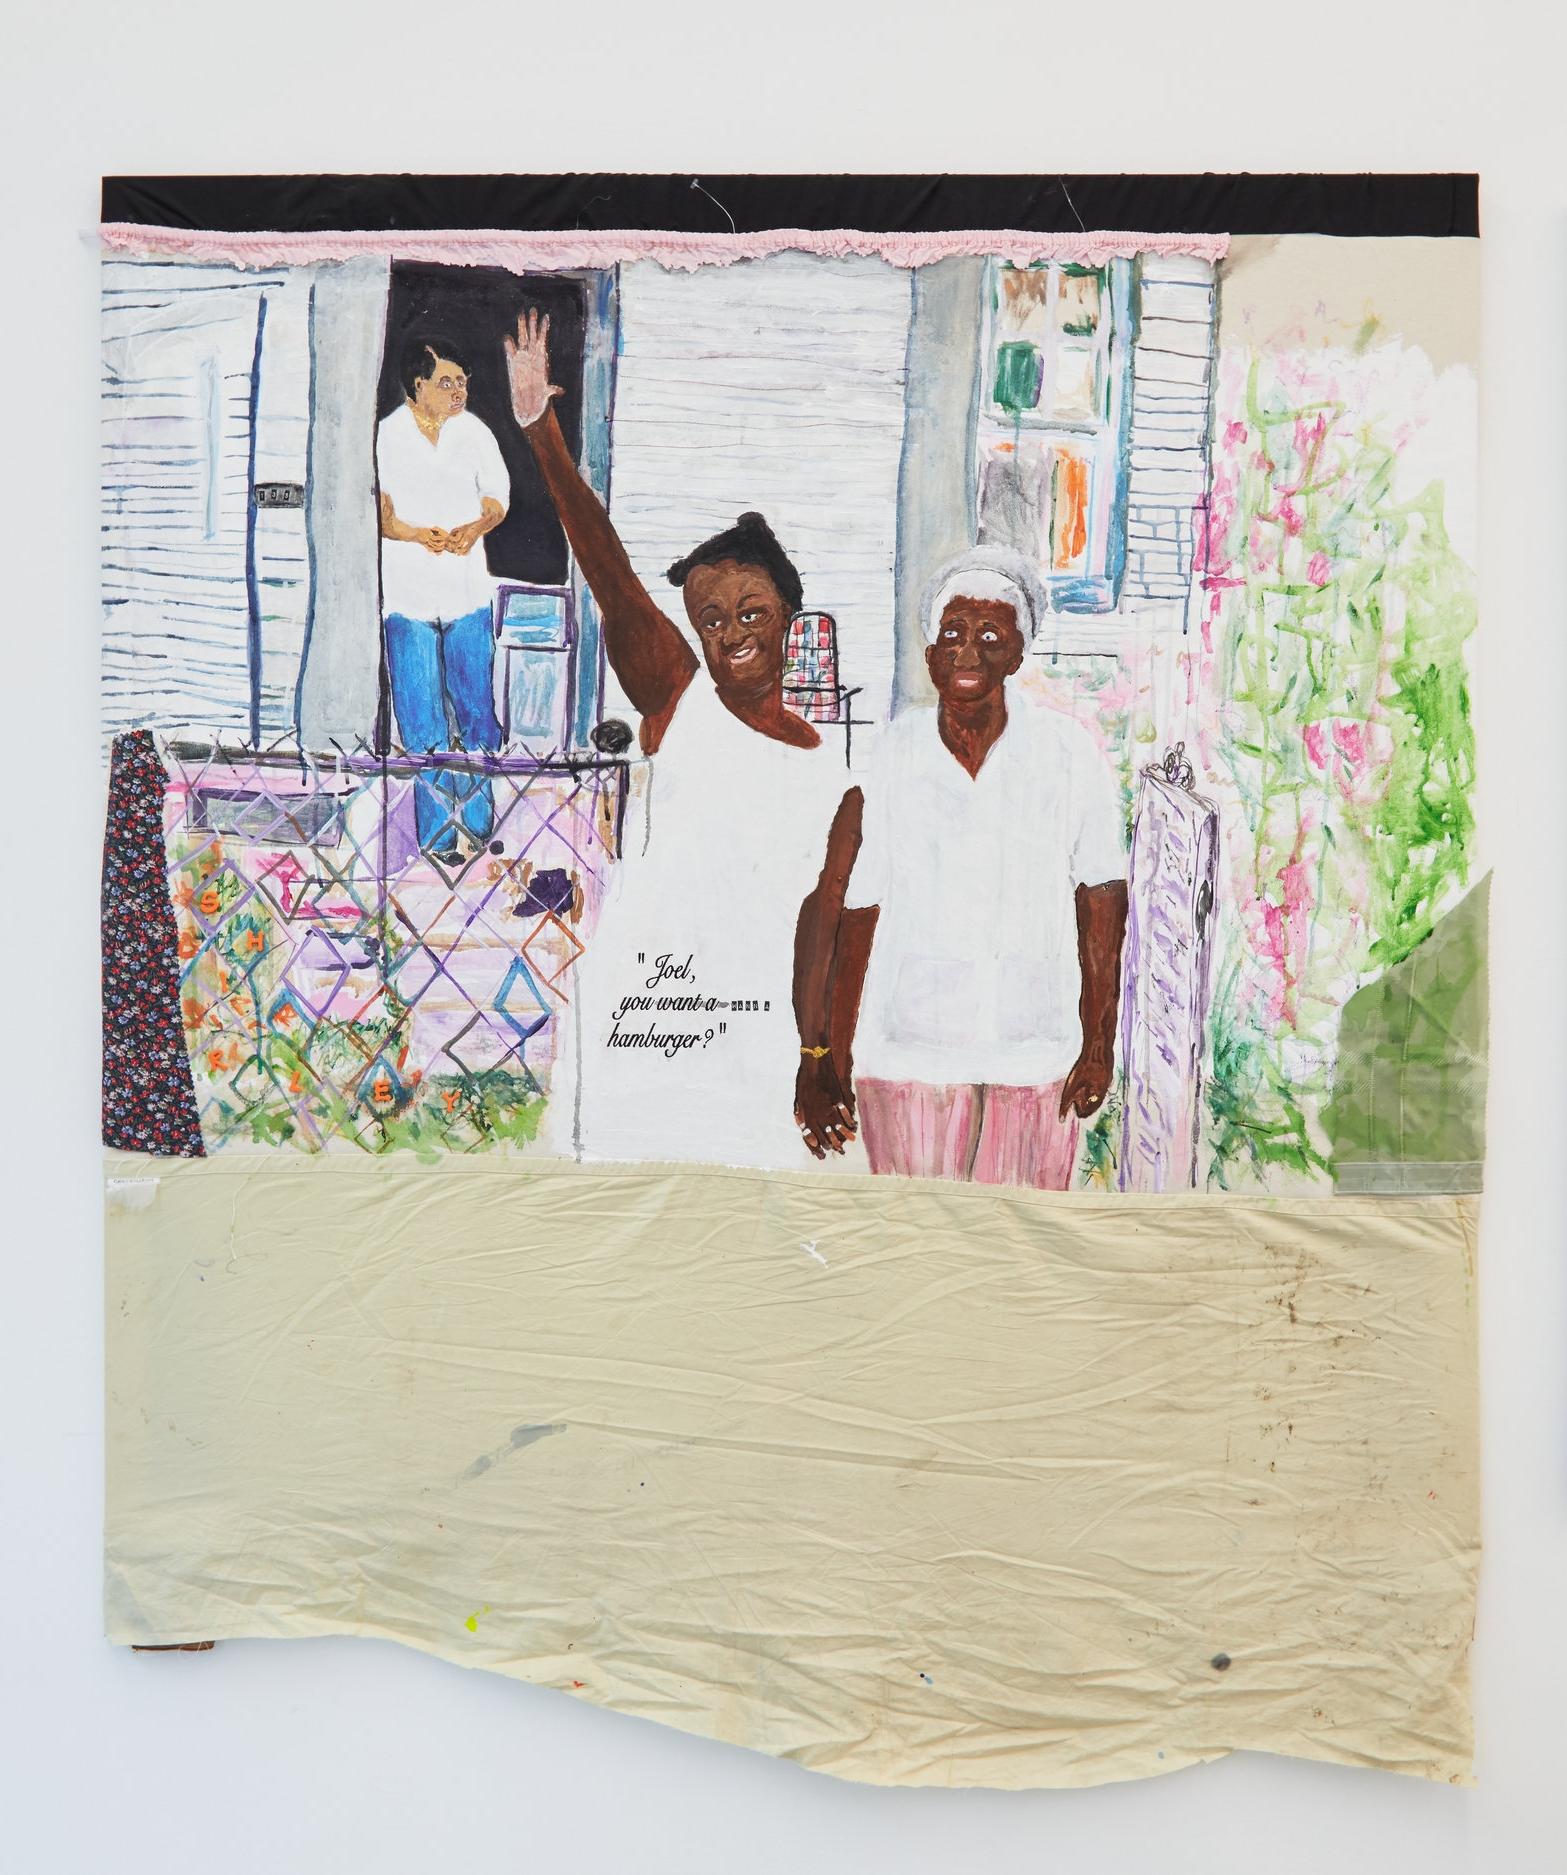 "Tameka Jenean Norris, ""Joel, You Want a Hamburger"", 2016, fabric, canvas, acrylic paint, thread, oil pastel, 50 x 50 in."